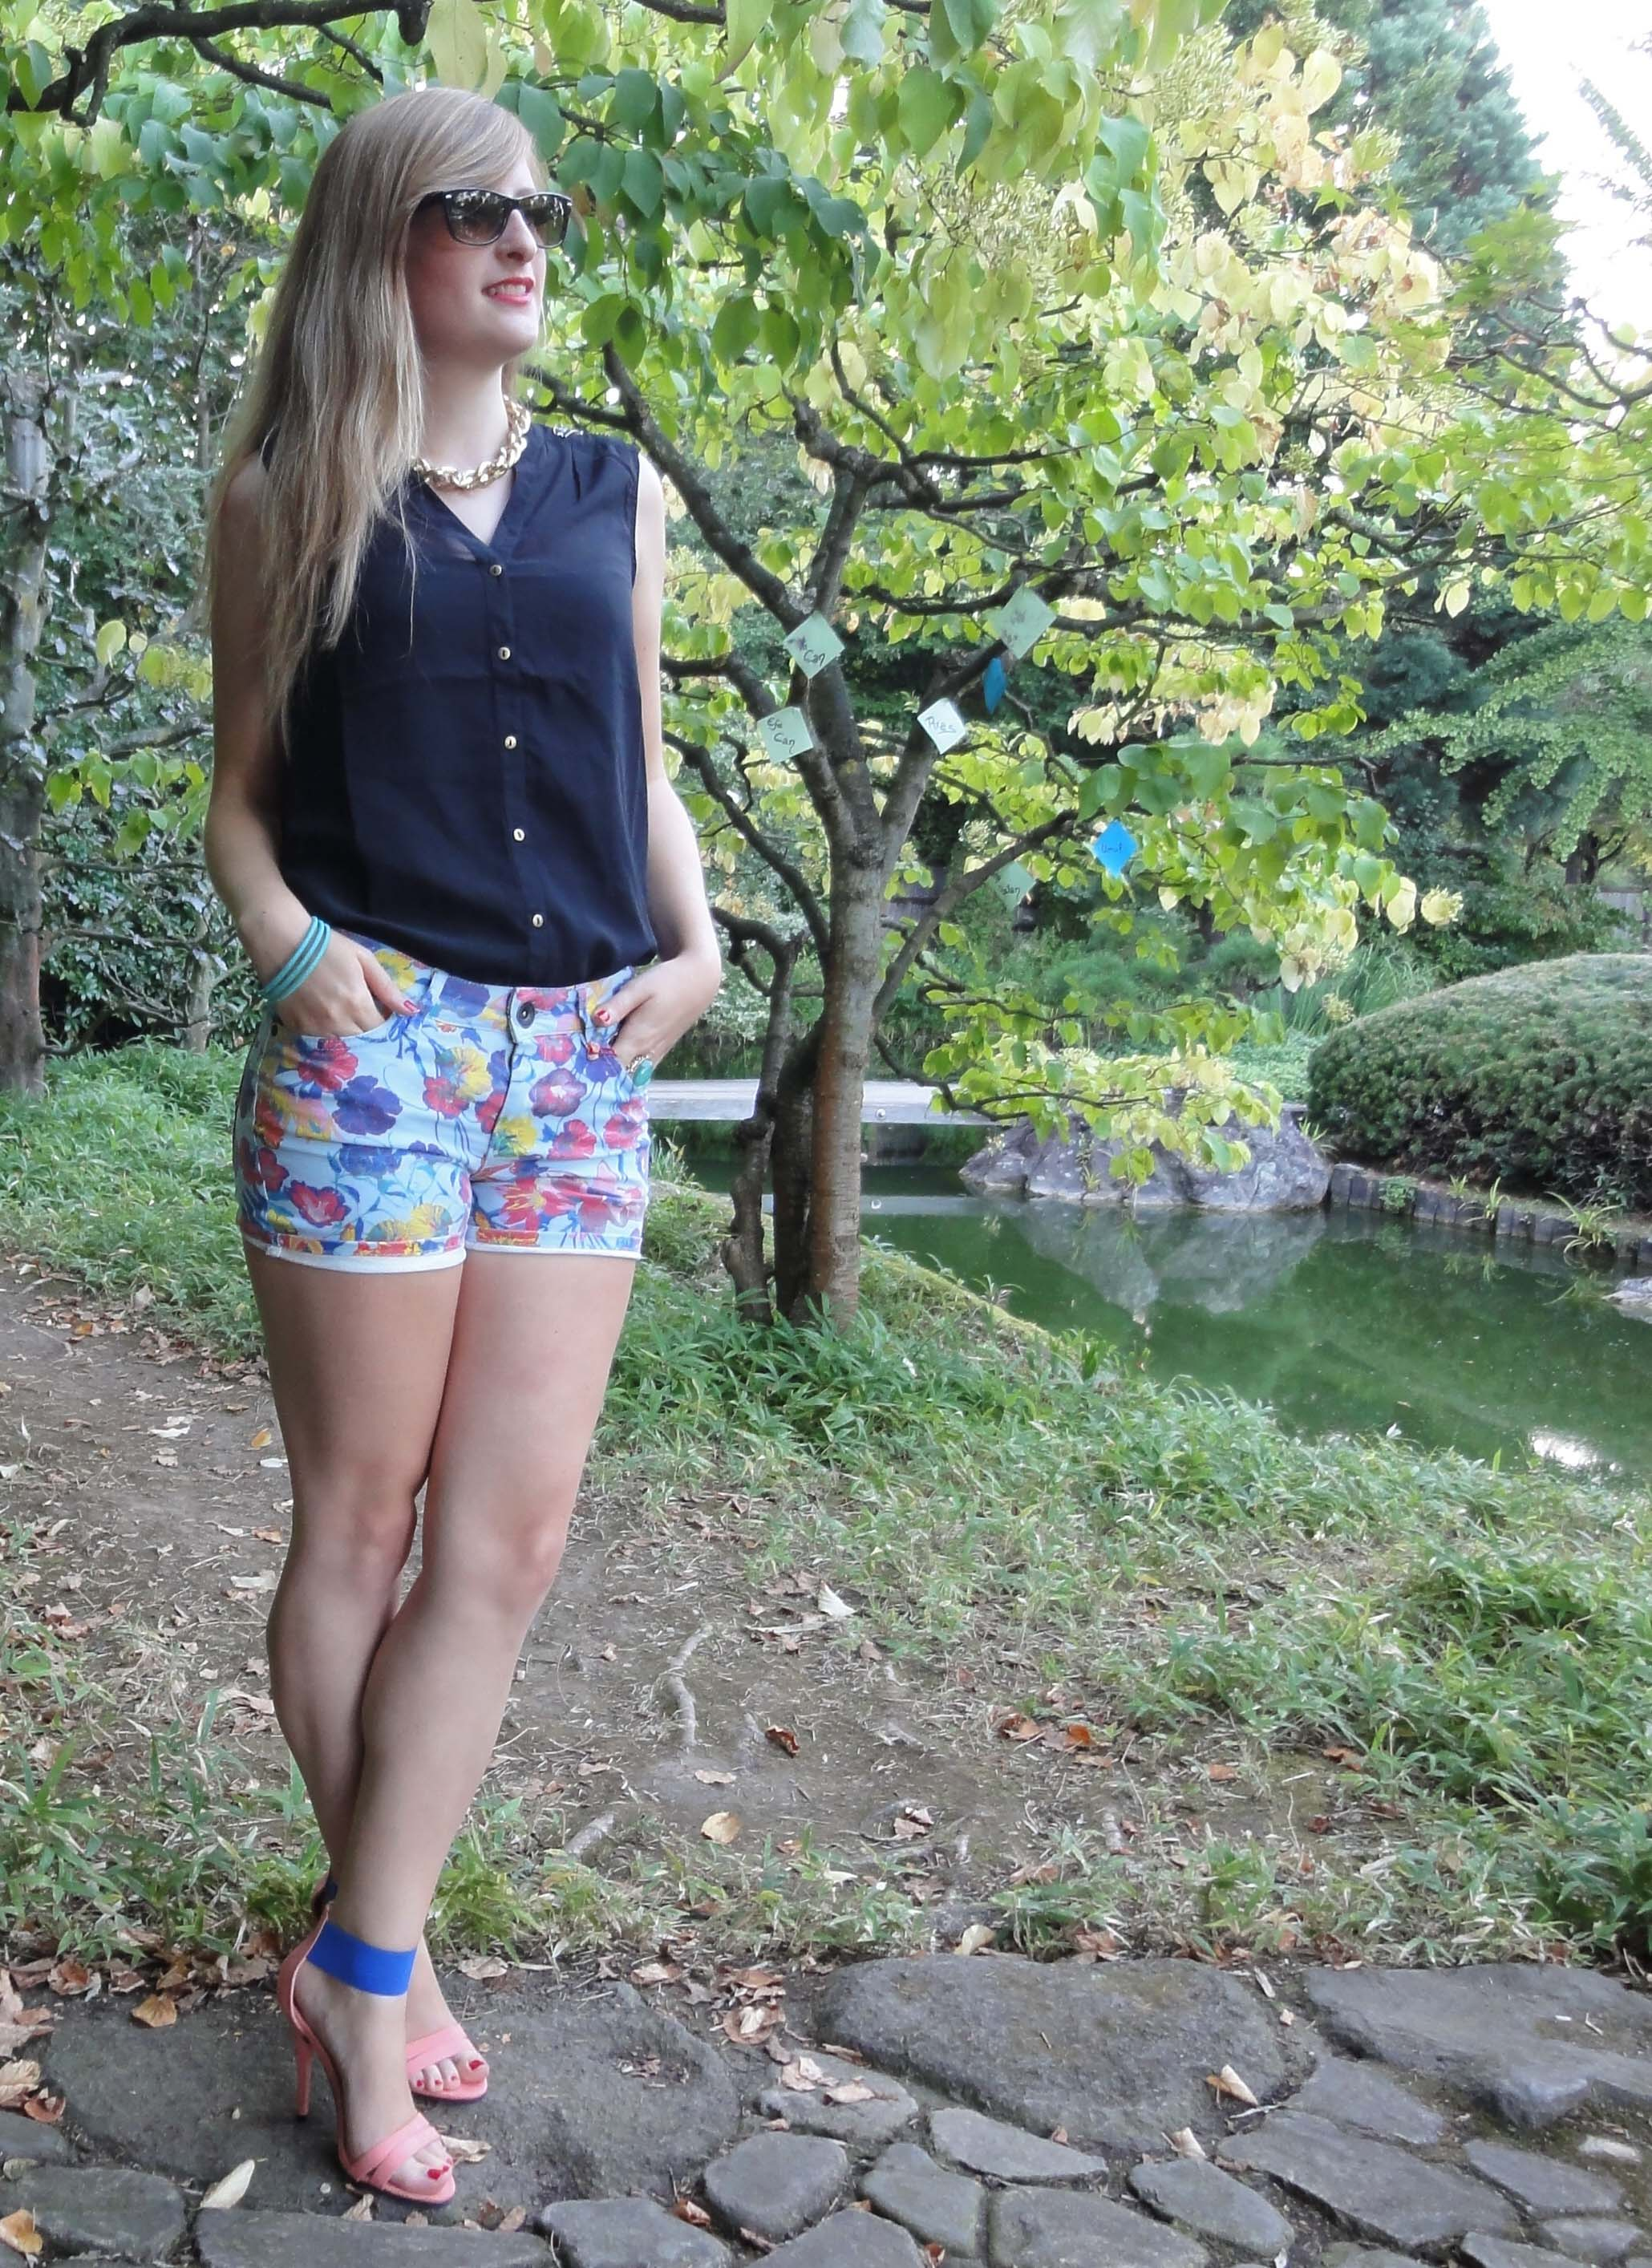 Bunte Hotpants Print Muster colofur Hot Pants kombinieren rosa blau Highheels schwarze Bluse Modeblog Bonn Rheinaue 4